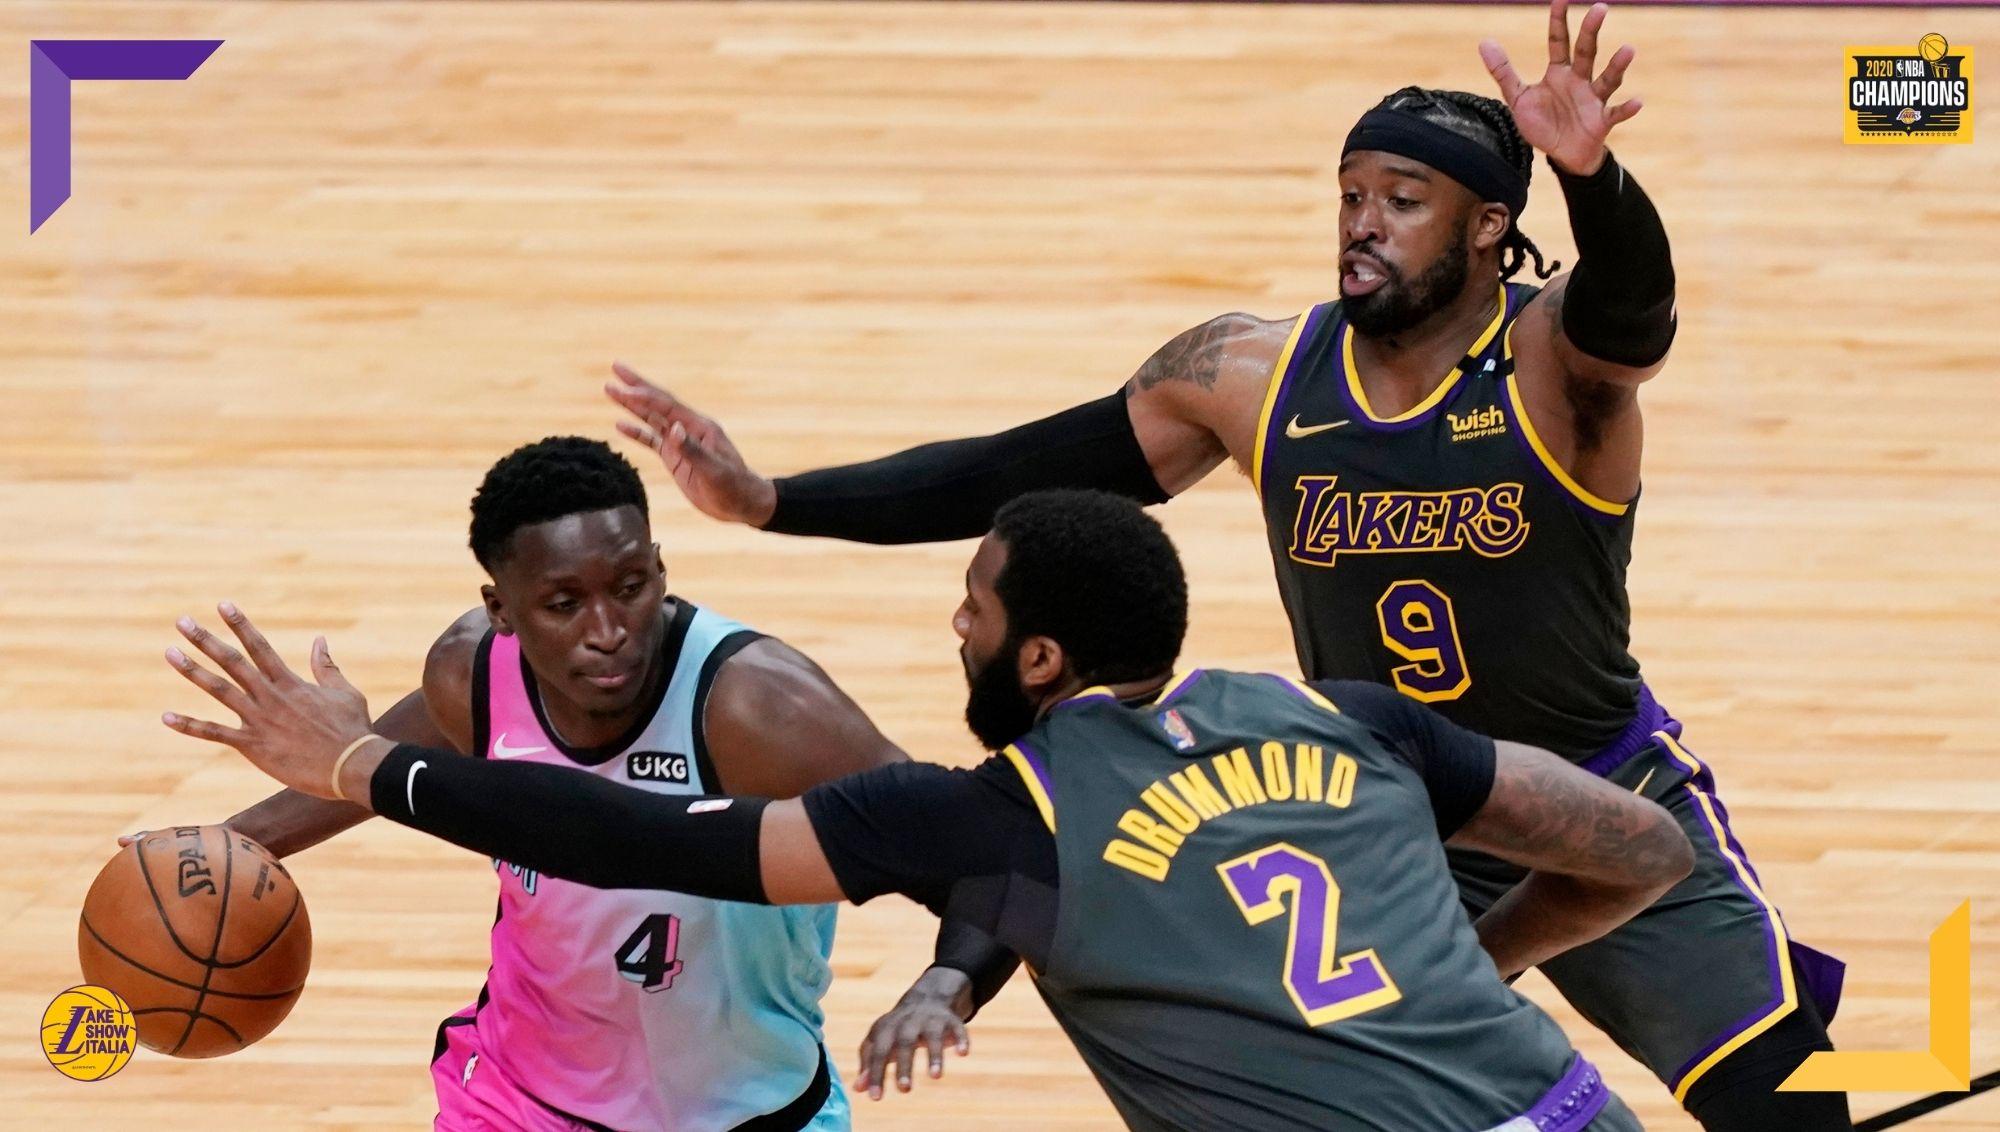 Senza James, Davis e Kuzma i Los Angeles Lakers ci provano, ma nel finale si piegano ai Miami Heat. Ottima prova di Kentavious Caldwell-Pope.